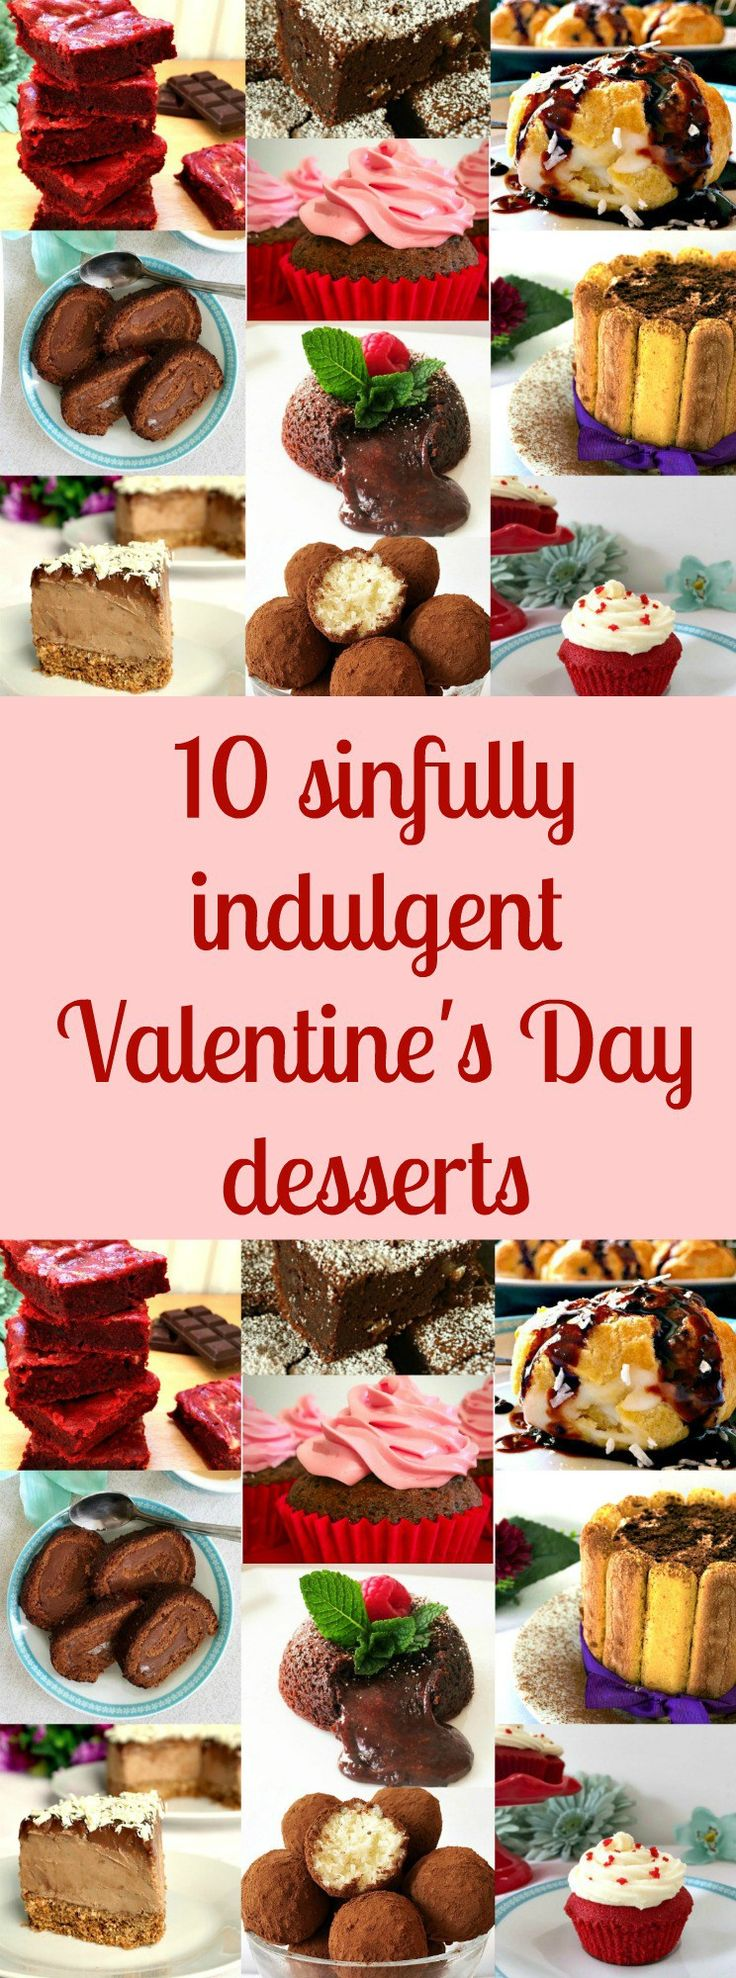 Paleo valentine s day meal ideas - 10 Sinfully Indulgent Valentine S Day Desserts